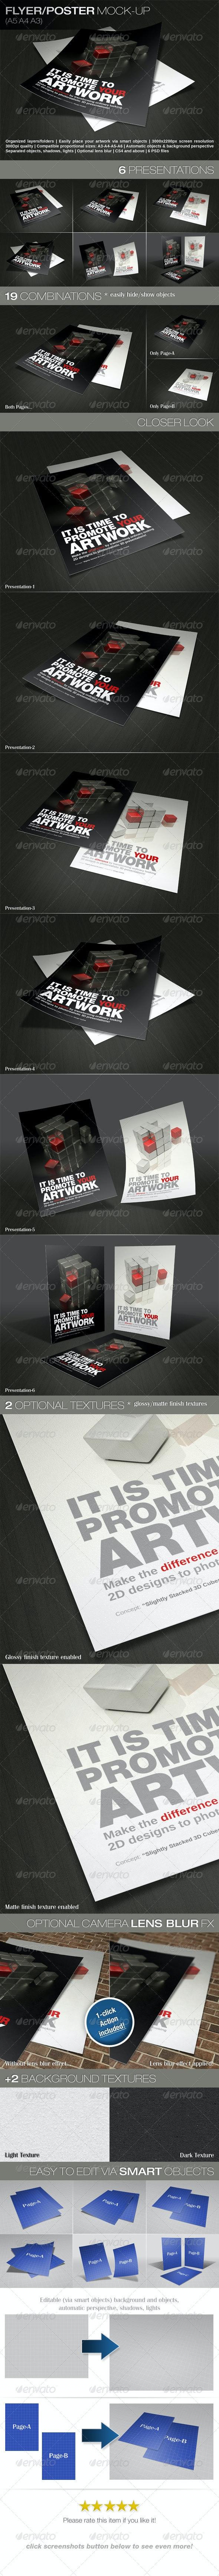 Photorealistic Flyer/Poster Mock-Up - Print Product Mock-Ups